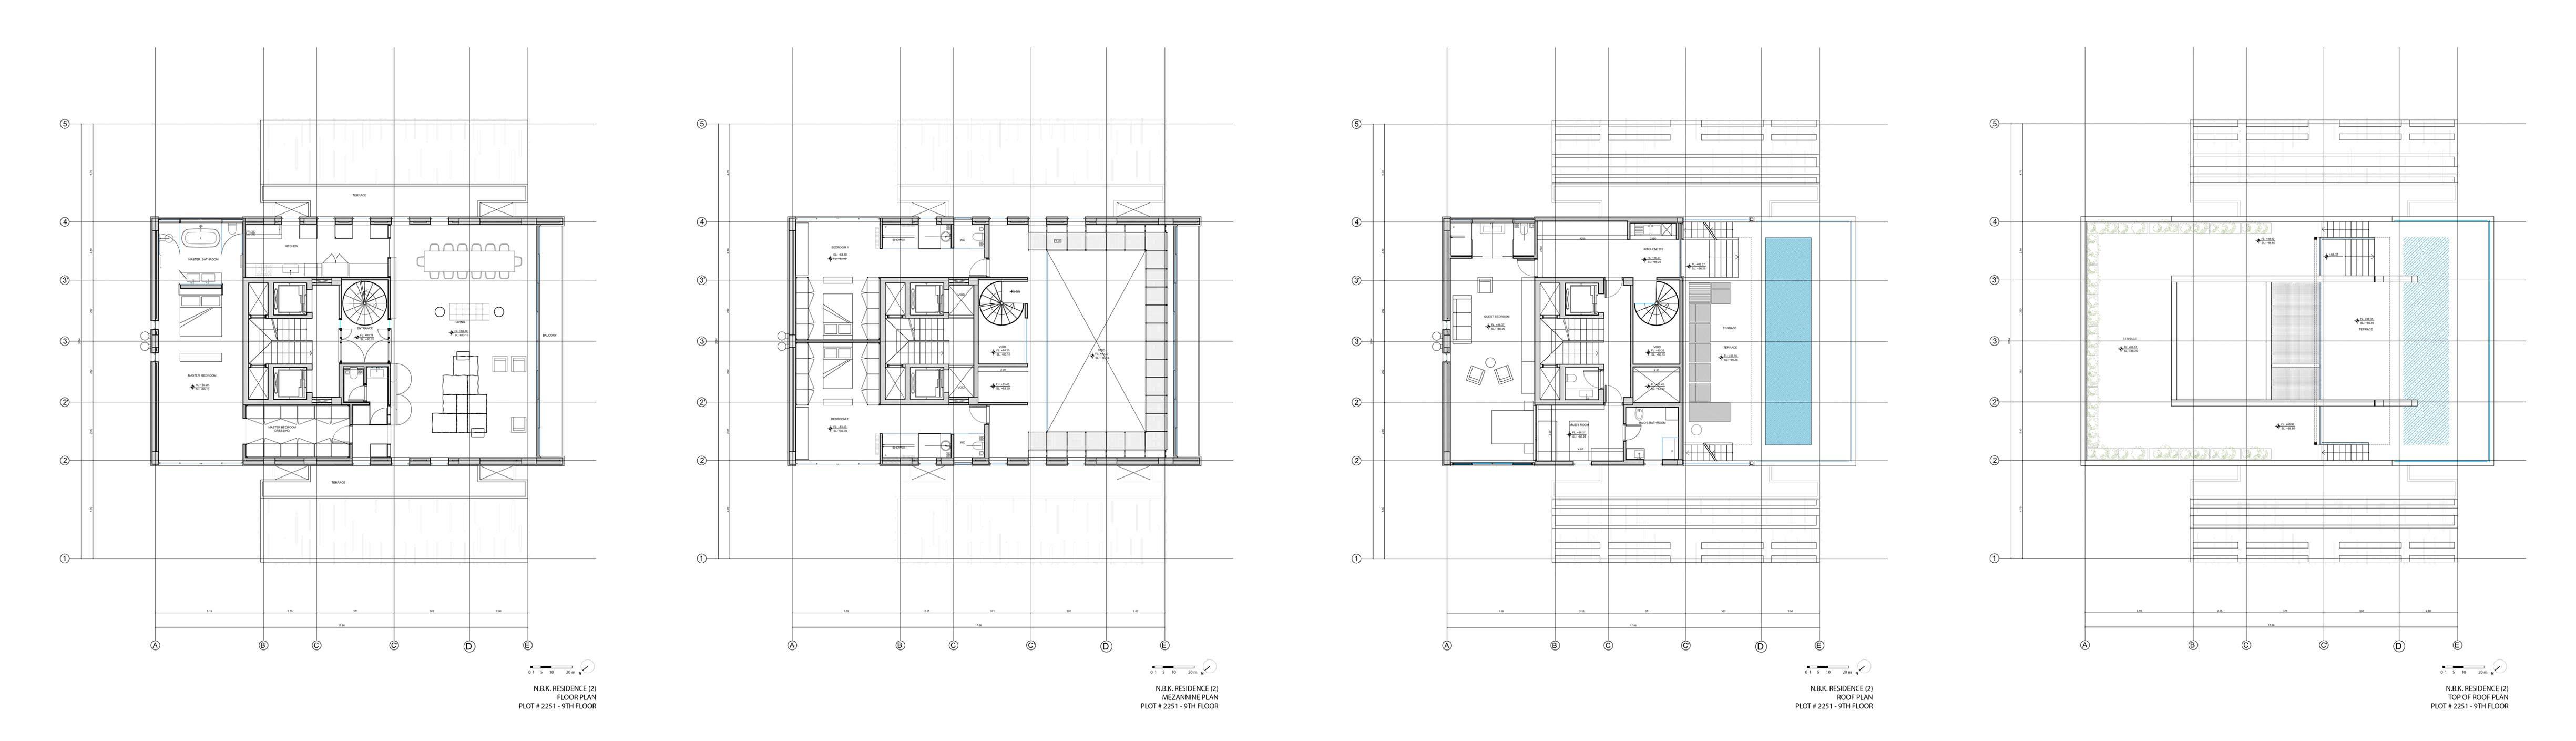 Floor Plan, Penthouse Apartment in Beirut, Lebanon